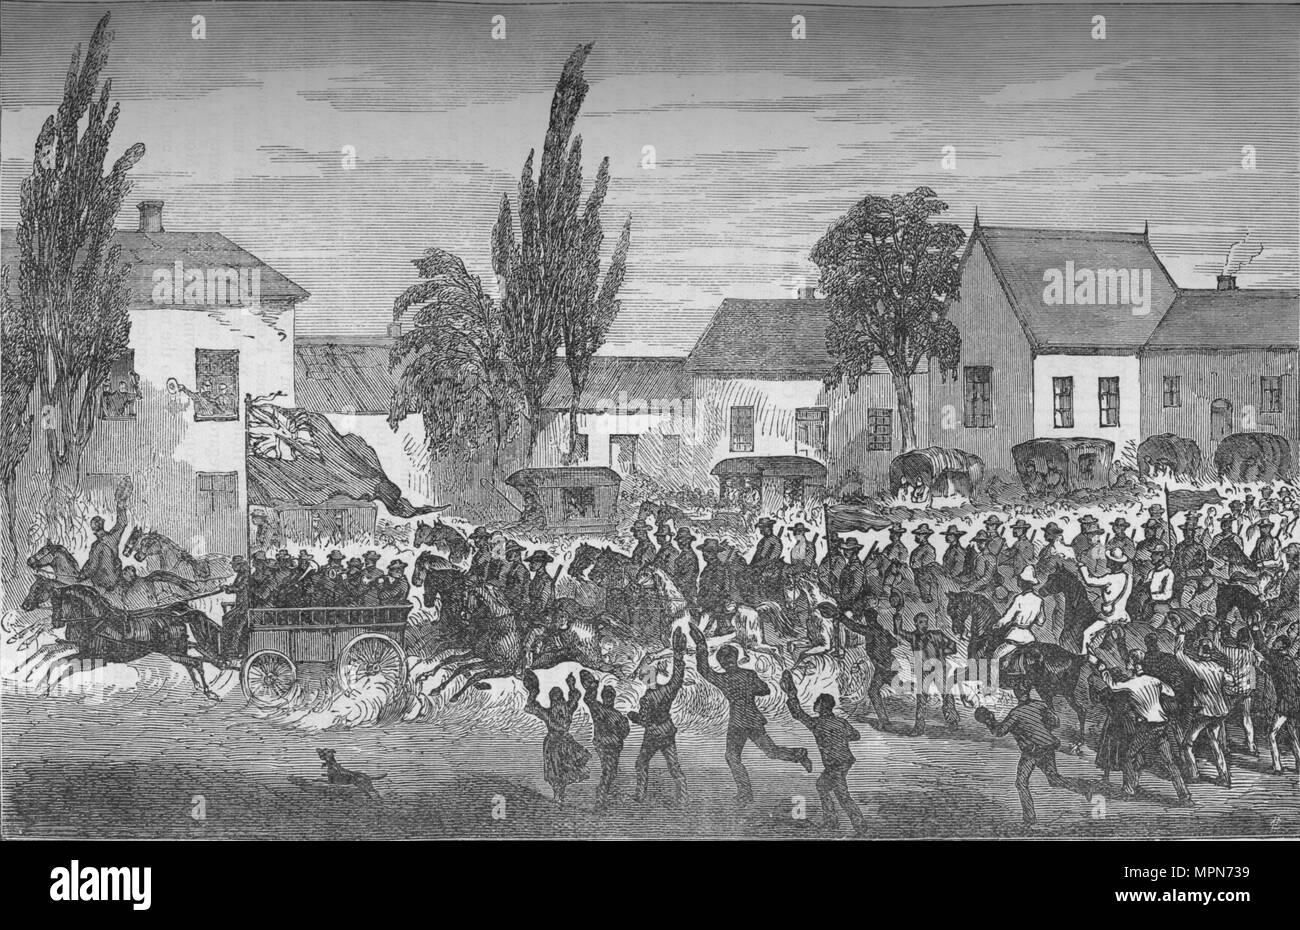 'Oudtshoorn Mounted Volunteers Starting for the Eastern Frontier', c1880. Artist: Unknown. - Stock Image